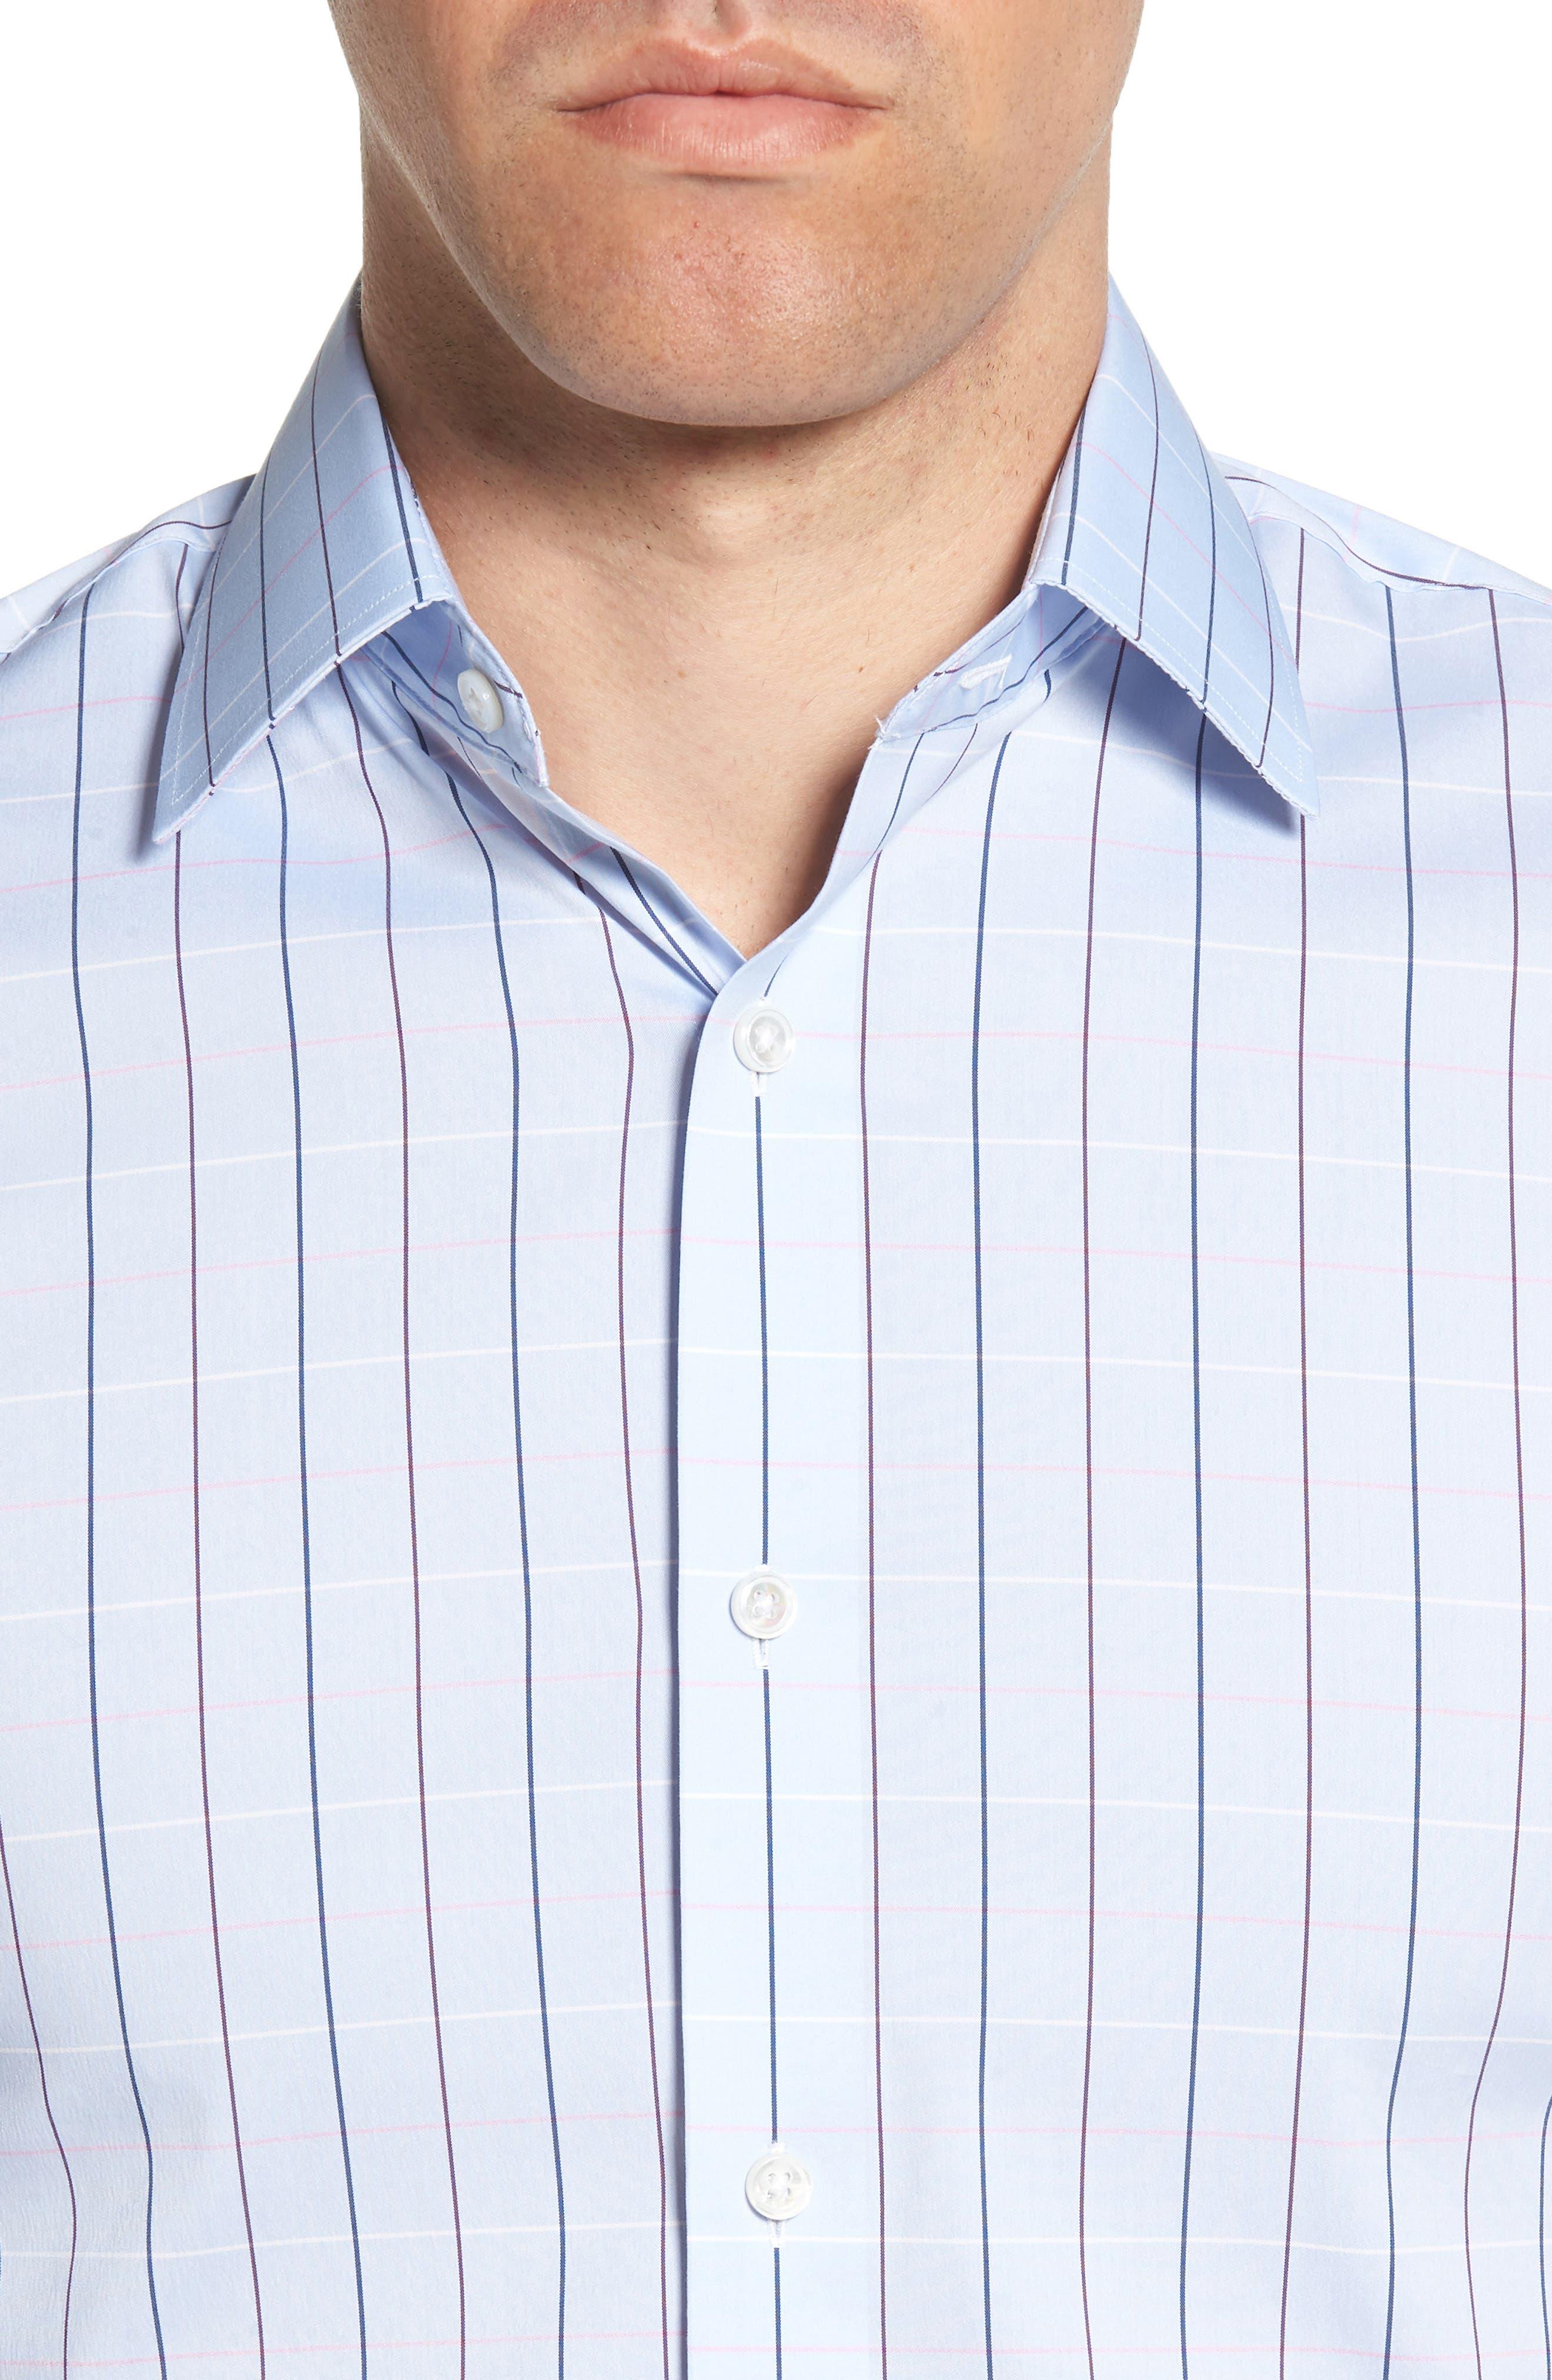 Jetsetter Slim Fit Stretch Check Dress Shirt,                             Alternate thumbnail 2, color,                             400